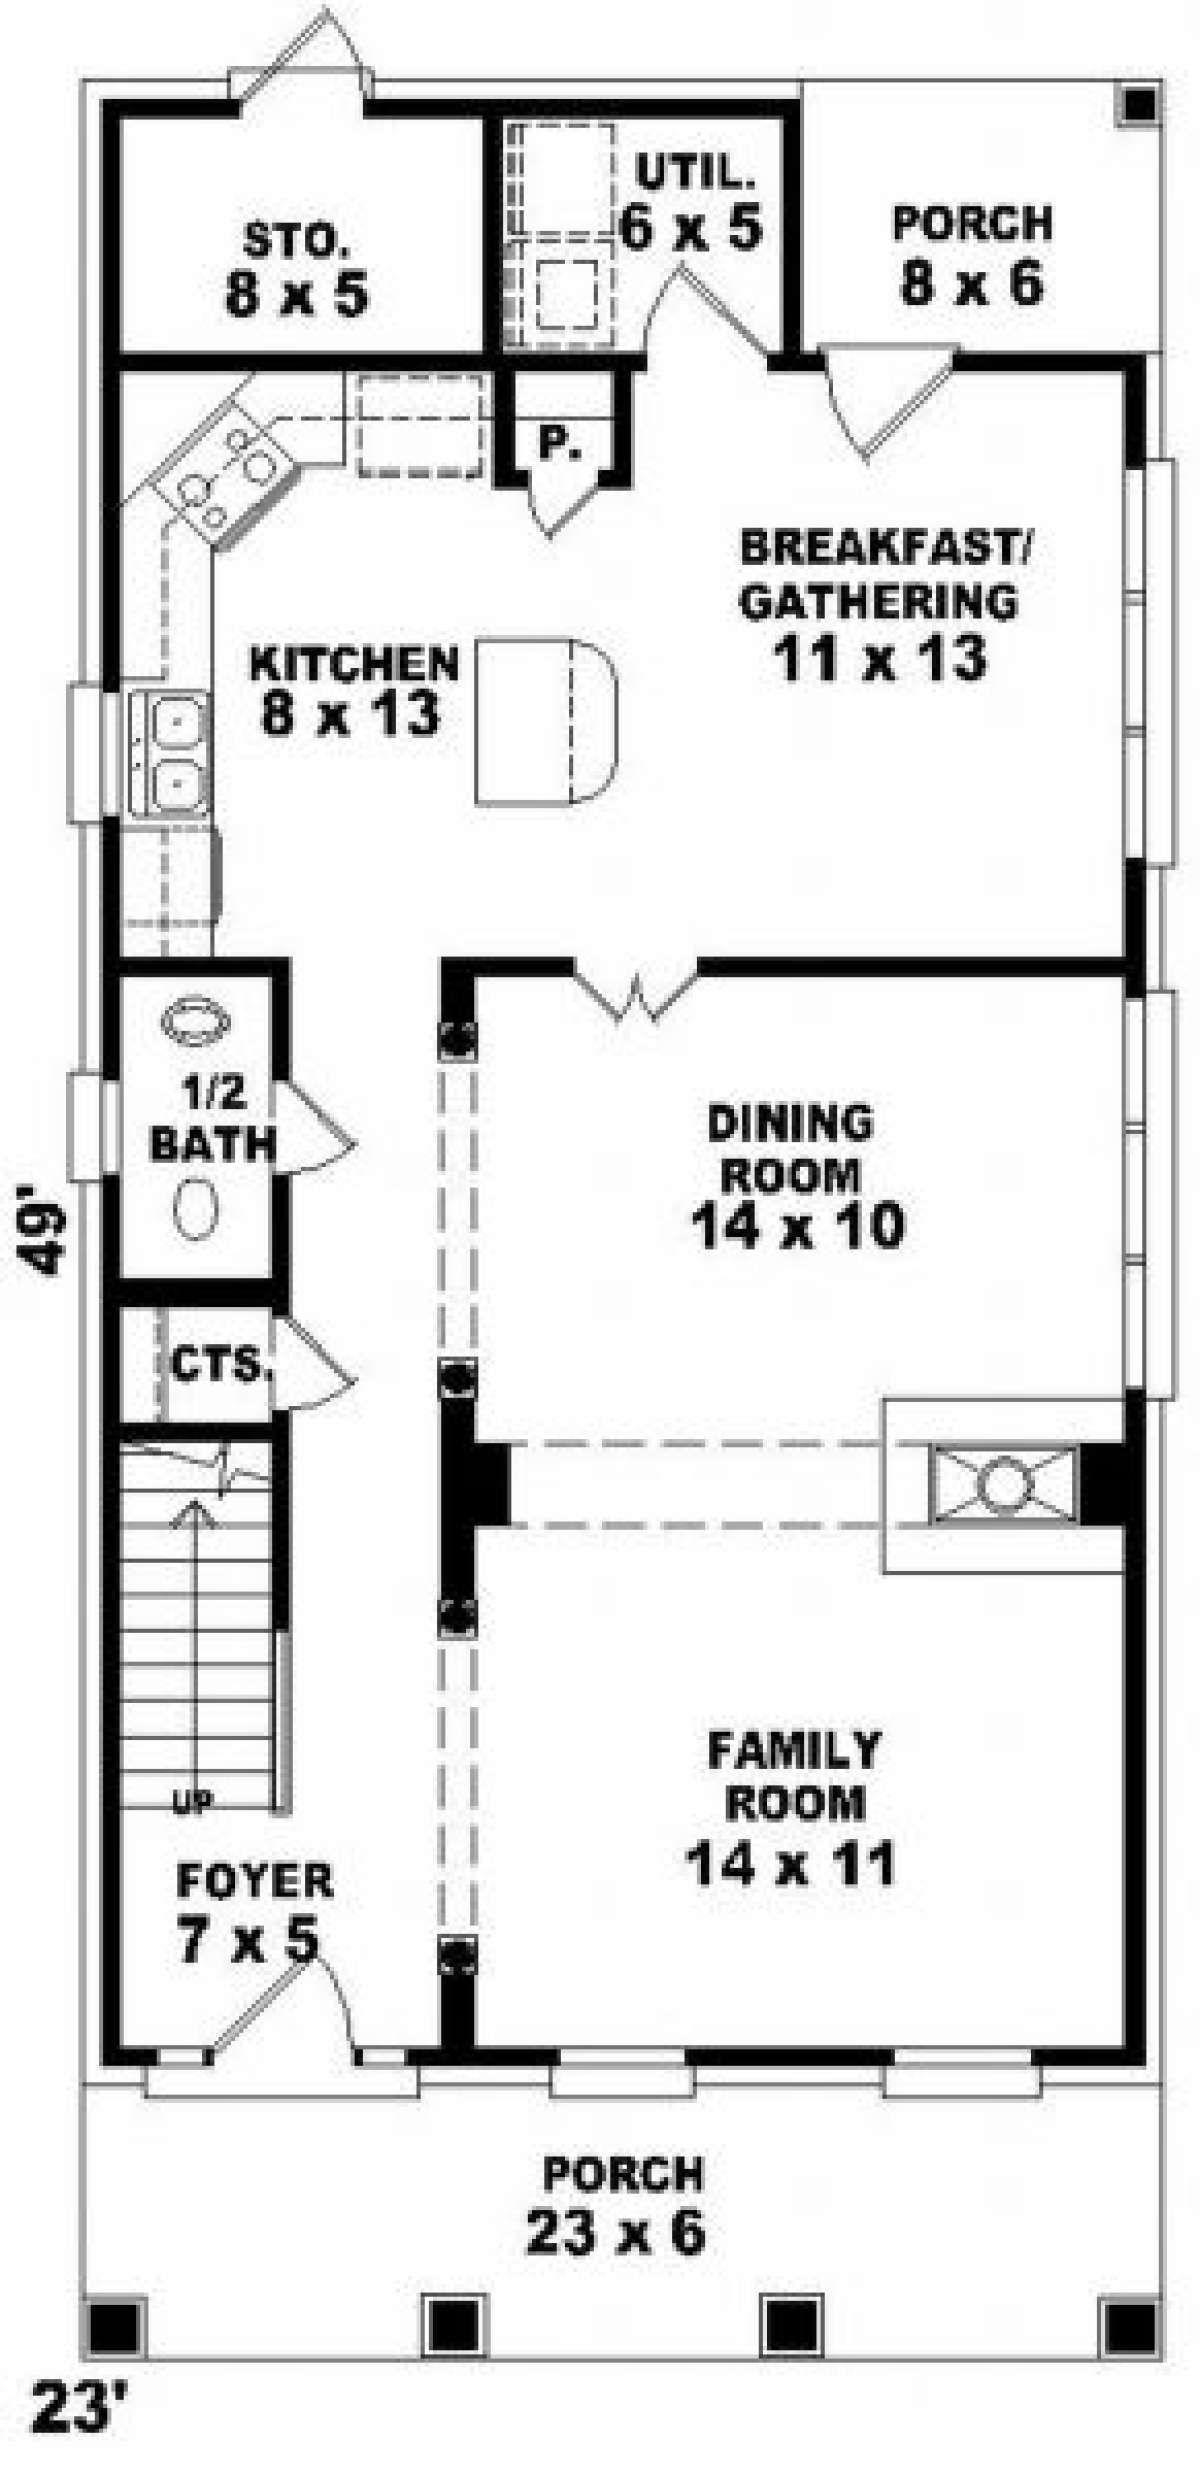 House Plan 053 00027 Narrow Lot Plan 1 824 Square Feet 3 Bedrooms 2 5 Bathrooms Narrow House Plans Narrow Lot House Plans Narrow Lot House